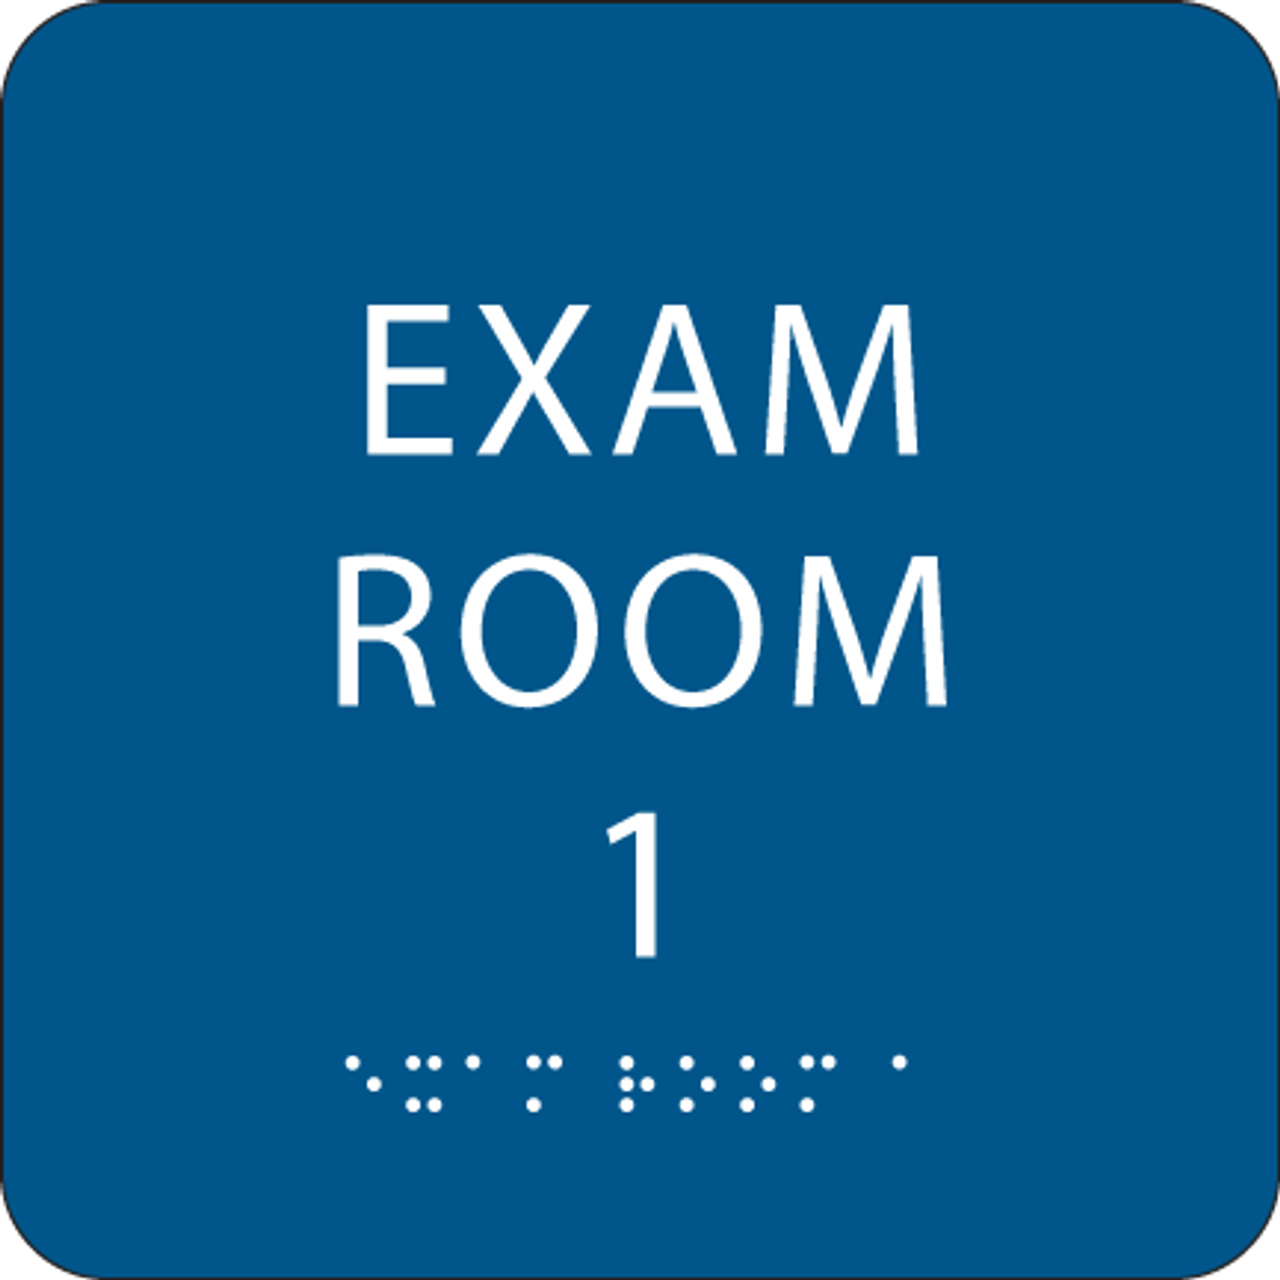 Royal Exam Room 1 ADA Sign